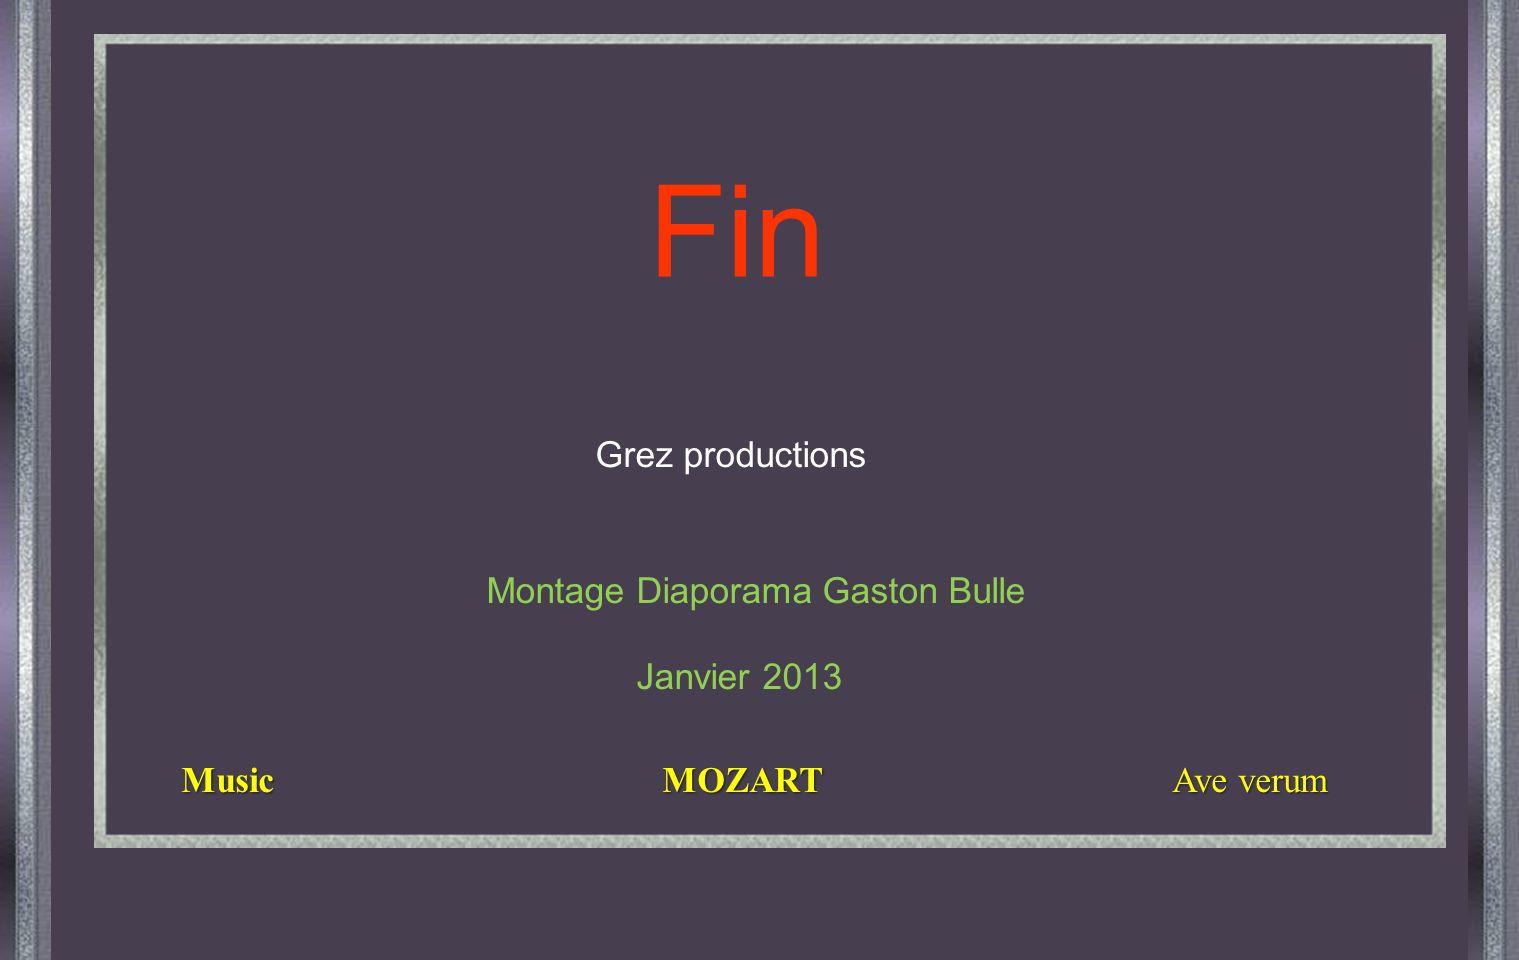 Grez productions Music MOZART Ave verum Music MOZART Ave verum Montage Diaporama Gaston Bulle Janvier 2013 Fin